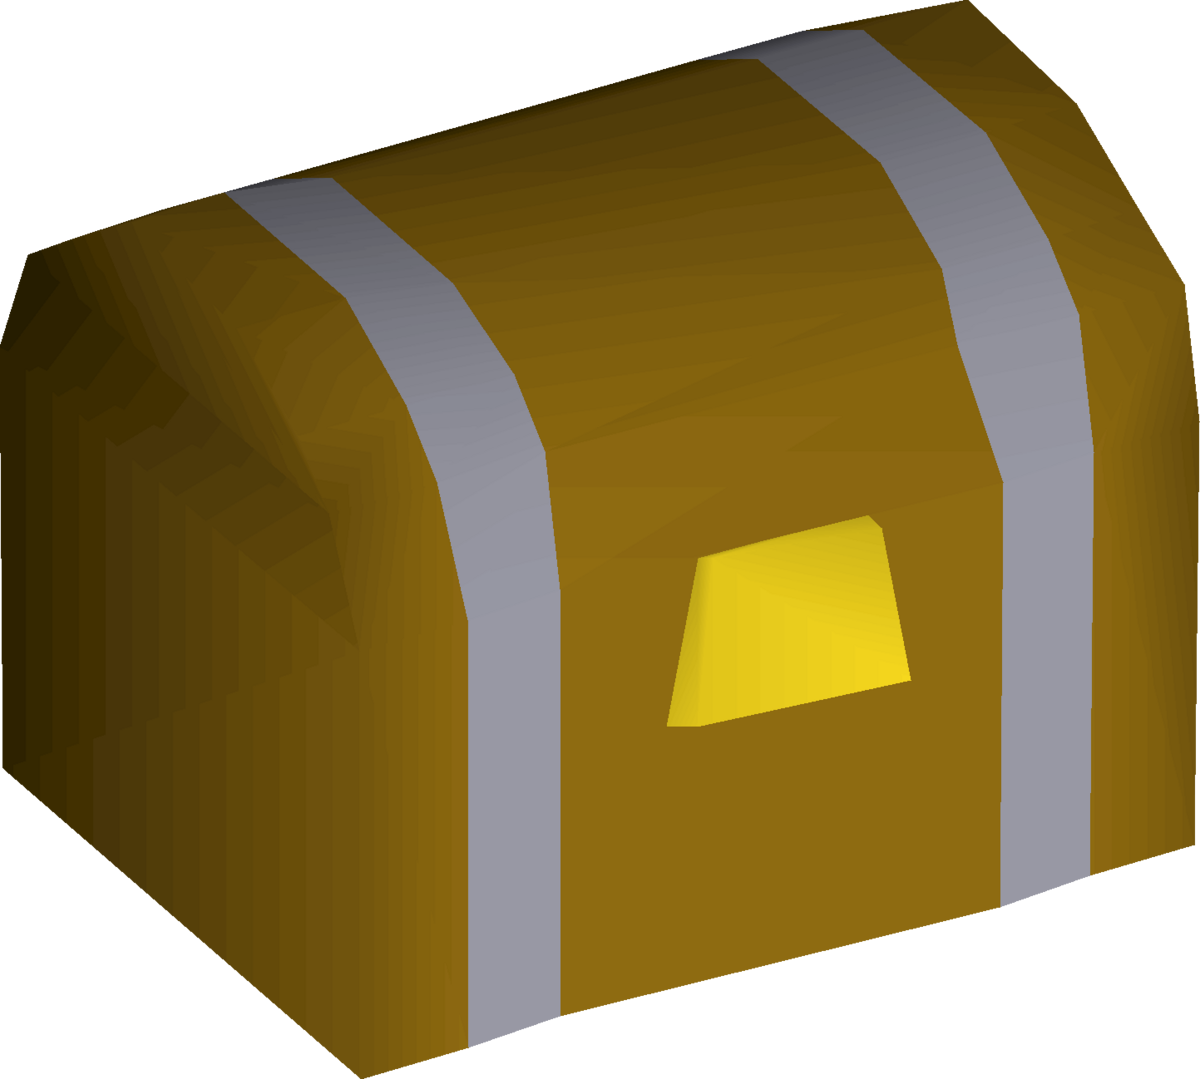 Osrs Elite Clue